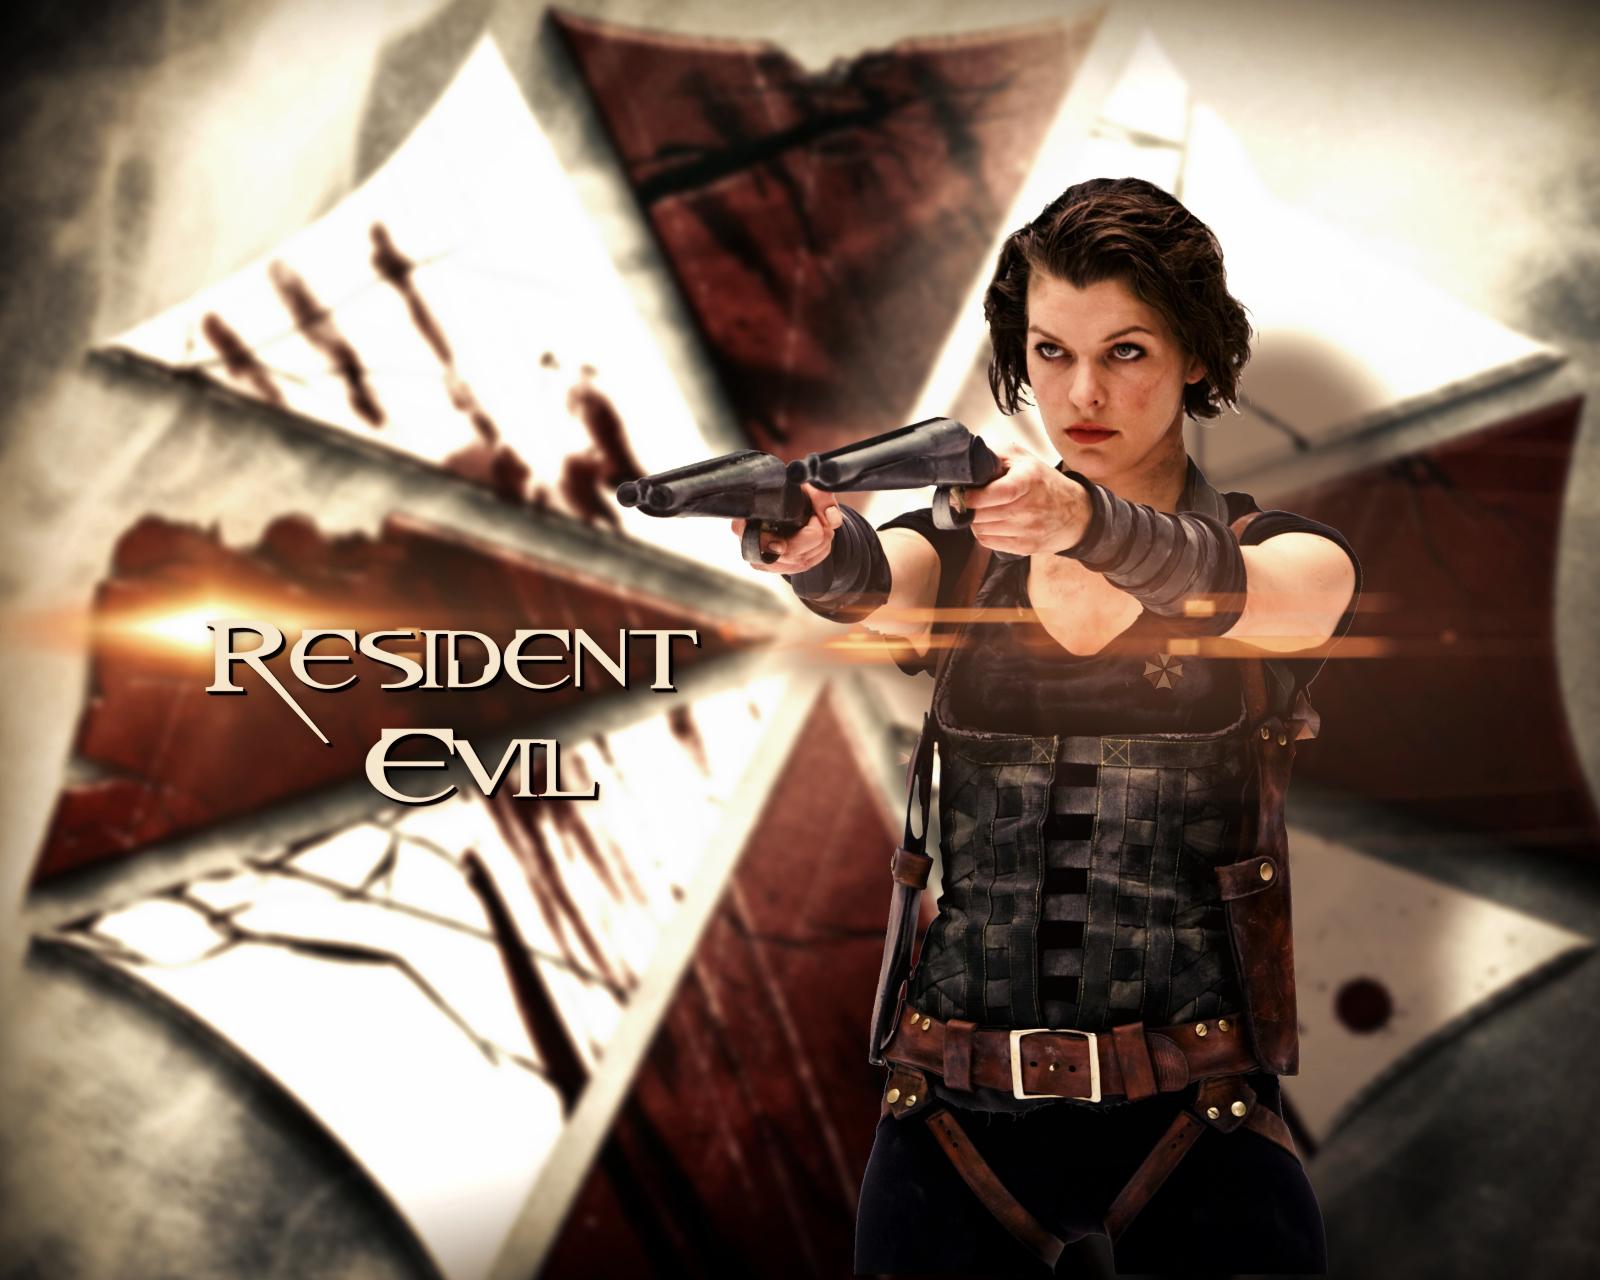 70 Resident Evil Milla Jovovich Wallpaper On Wallpapersafari